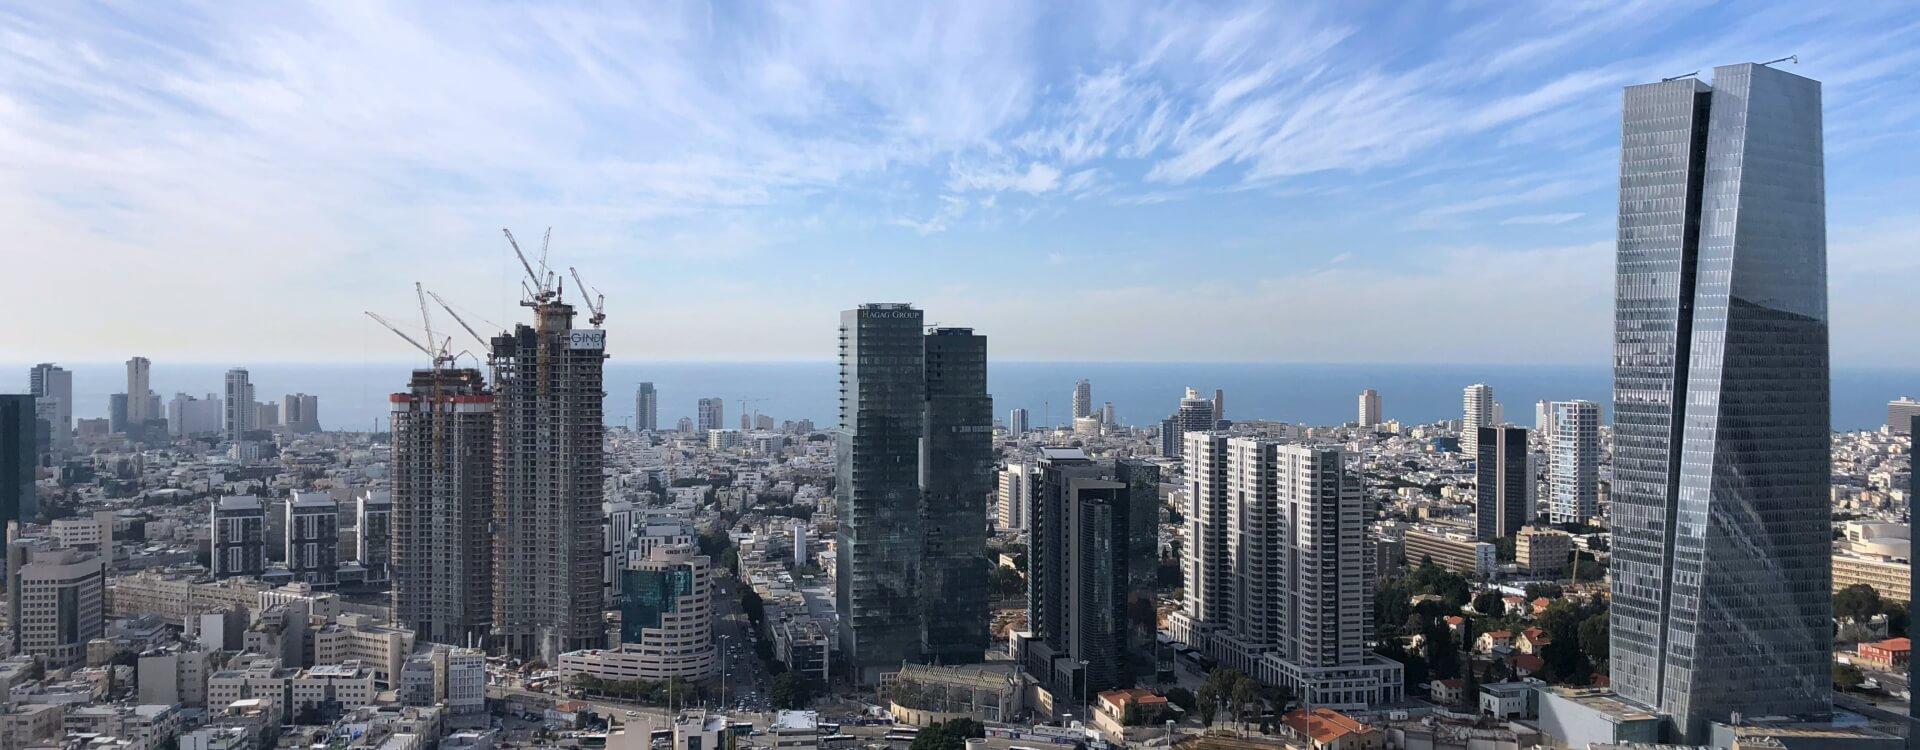 israel-view-tel-aviv-from